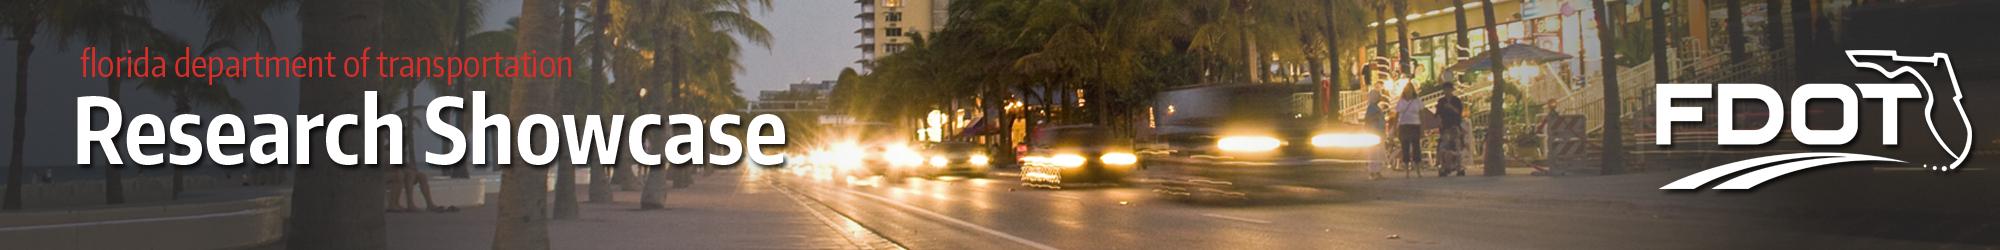 FDOT Wrong Way Driving Initiative Receives National Roadway